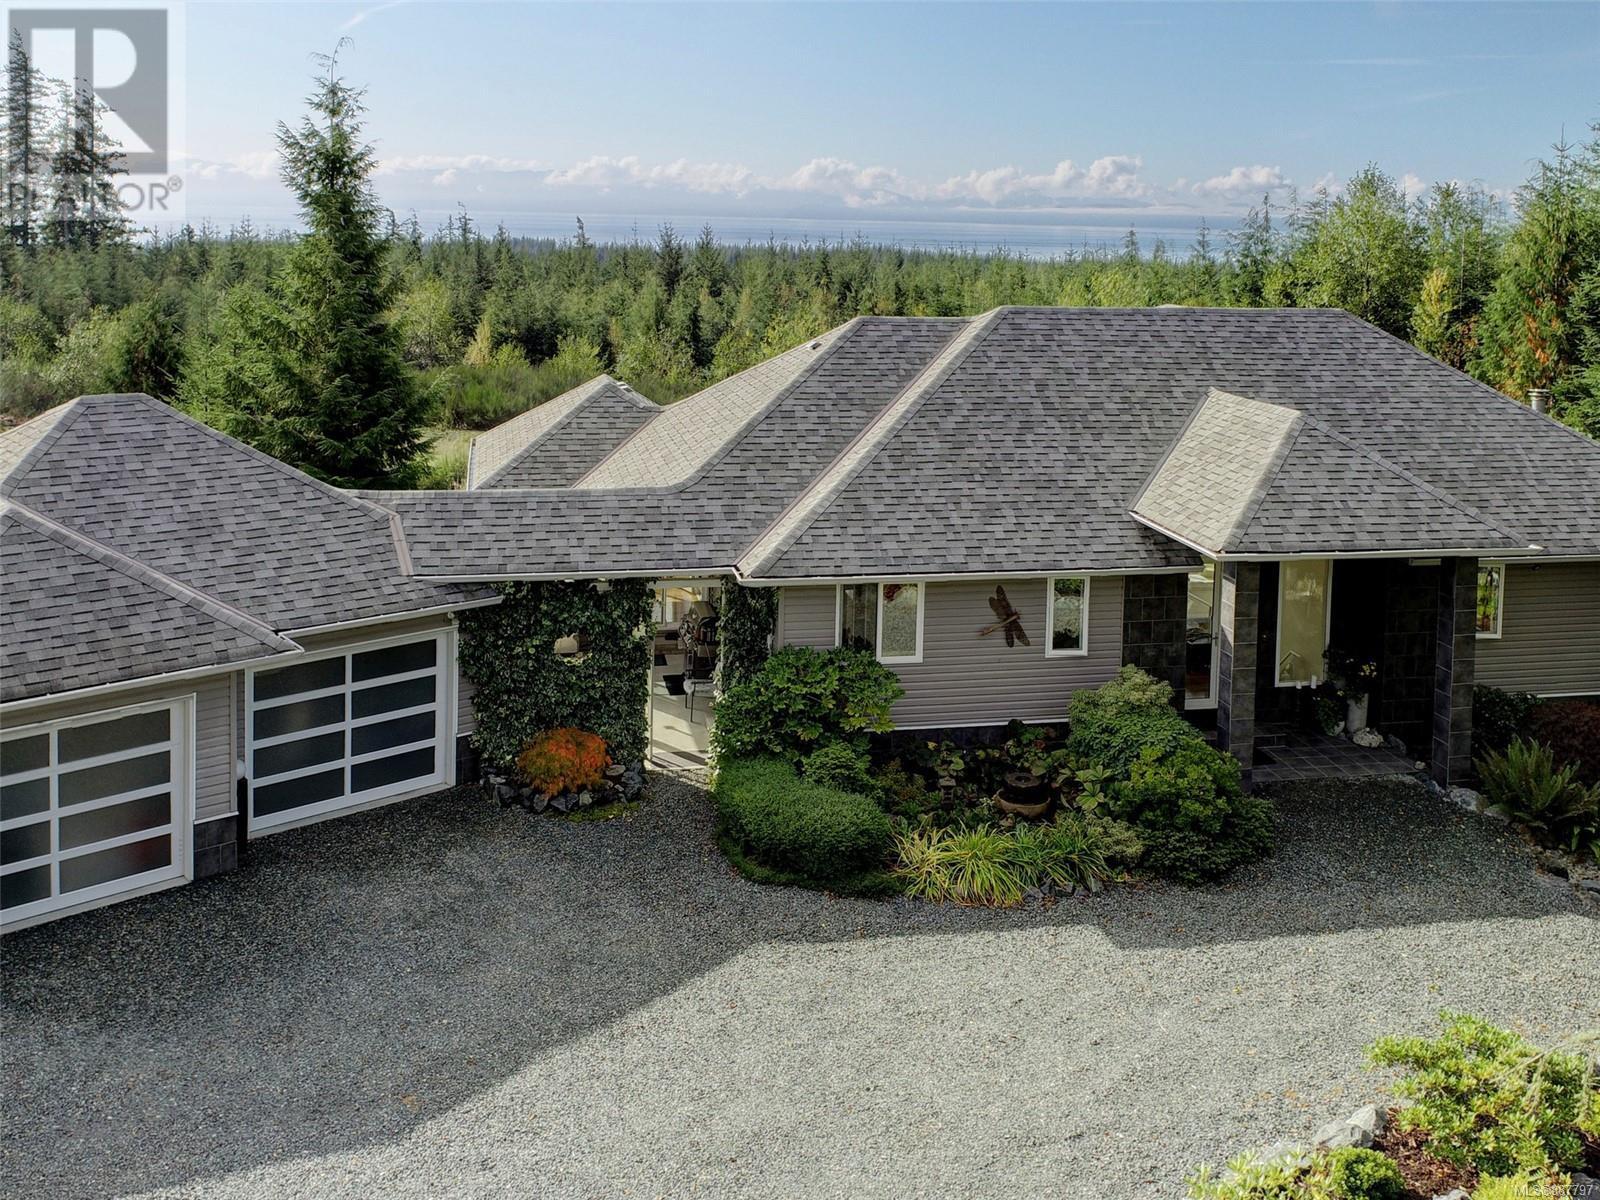 3951 Trailhead DrSooke, British Columbia  V9Z 1L1 - Photo 49 - 887797